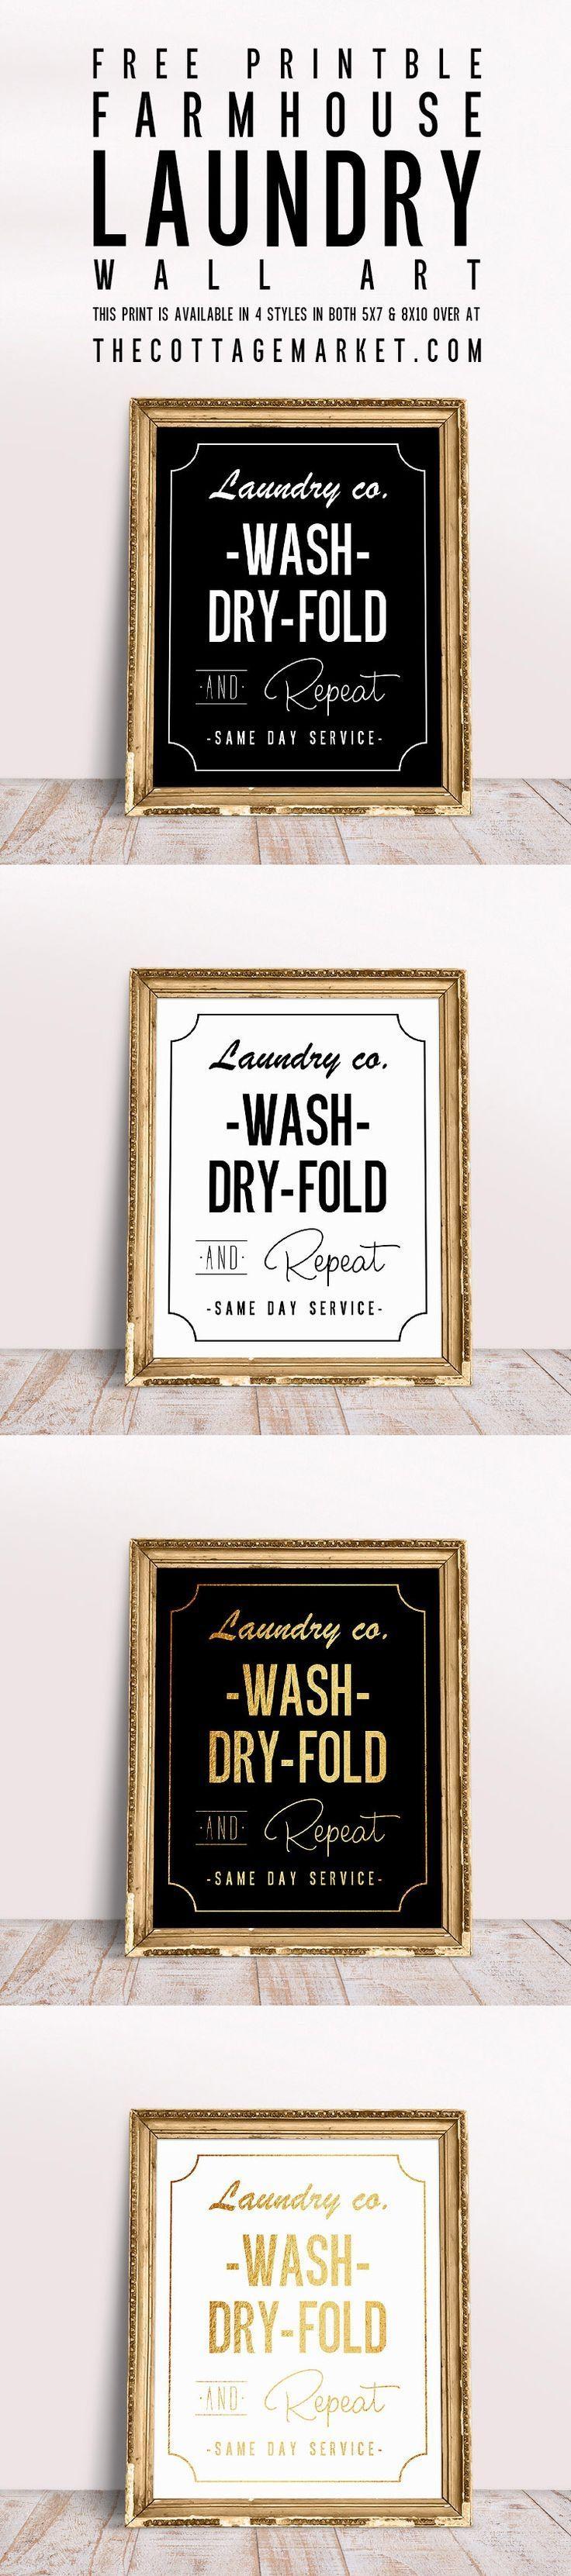 Best 25+ Laundry Room Art Ideas On Pinterest | Laundry Art Regarding Laundry Room Wall Art (View 20 of 20)